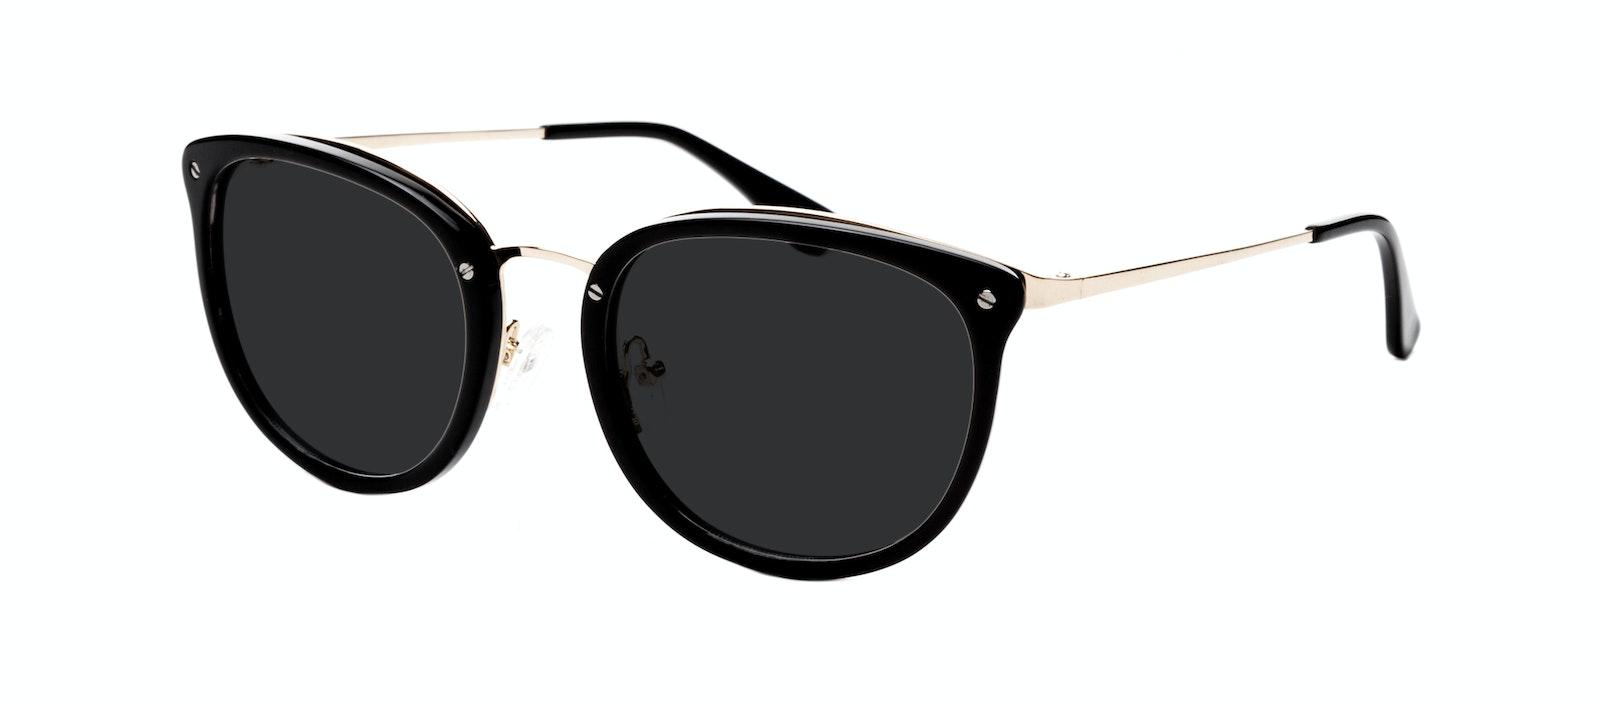 Affordable Fashion Glasses Square Round Sunglasses Women Amaze Onyx Tilt